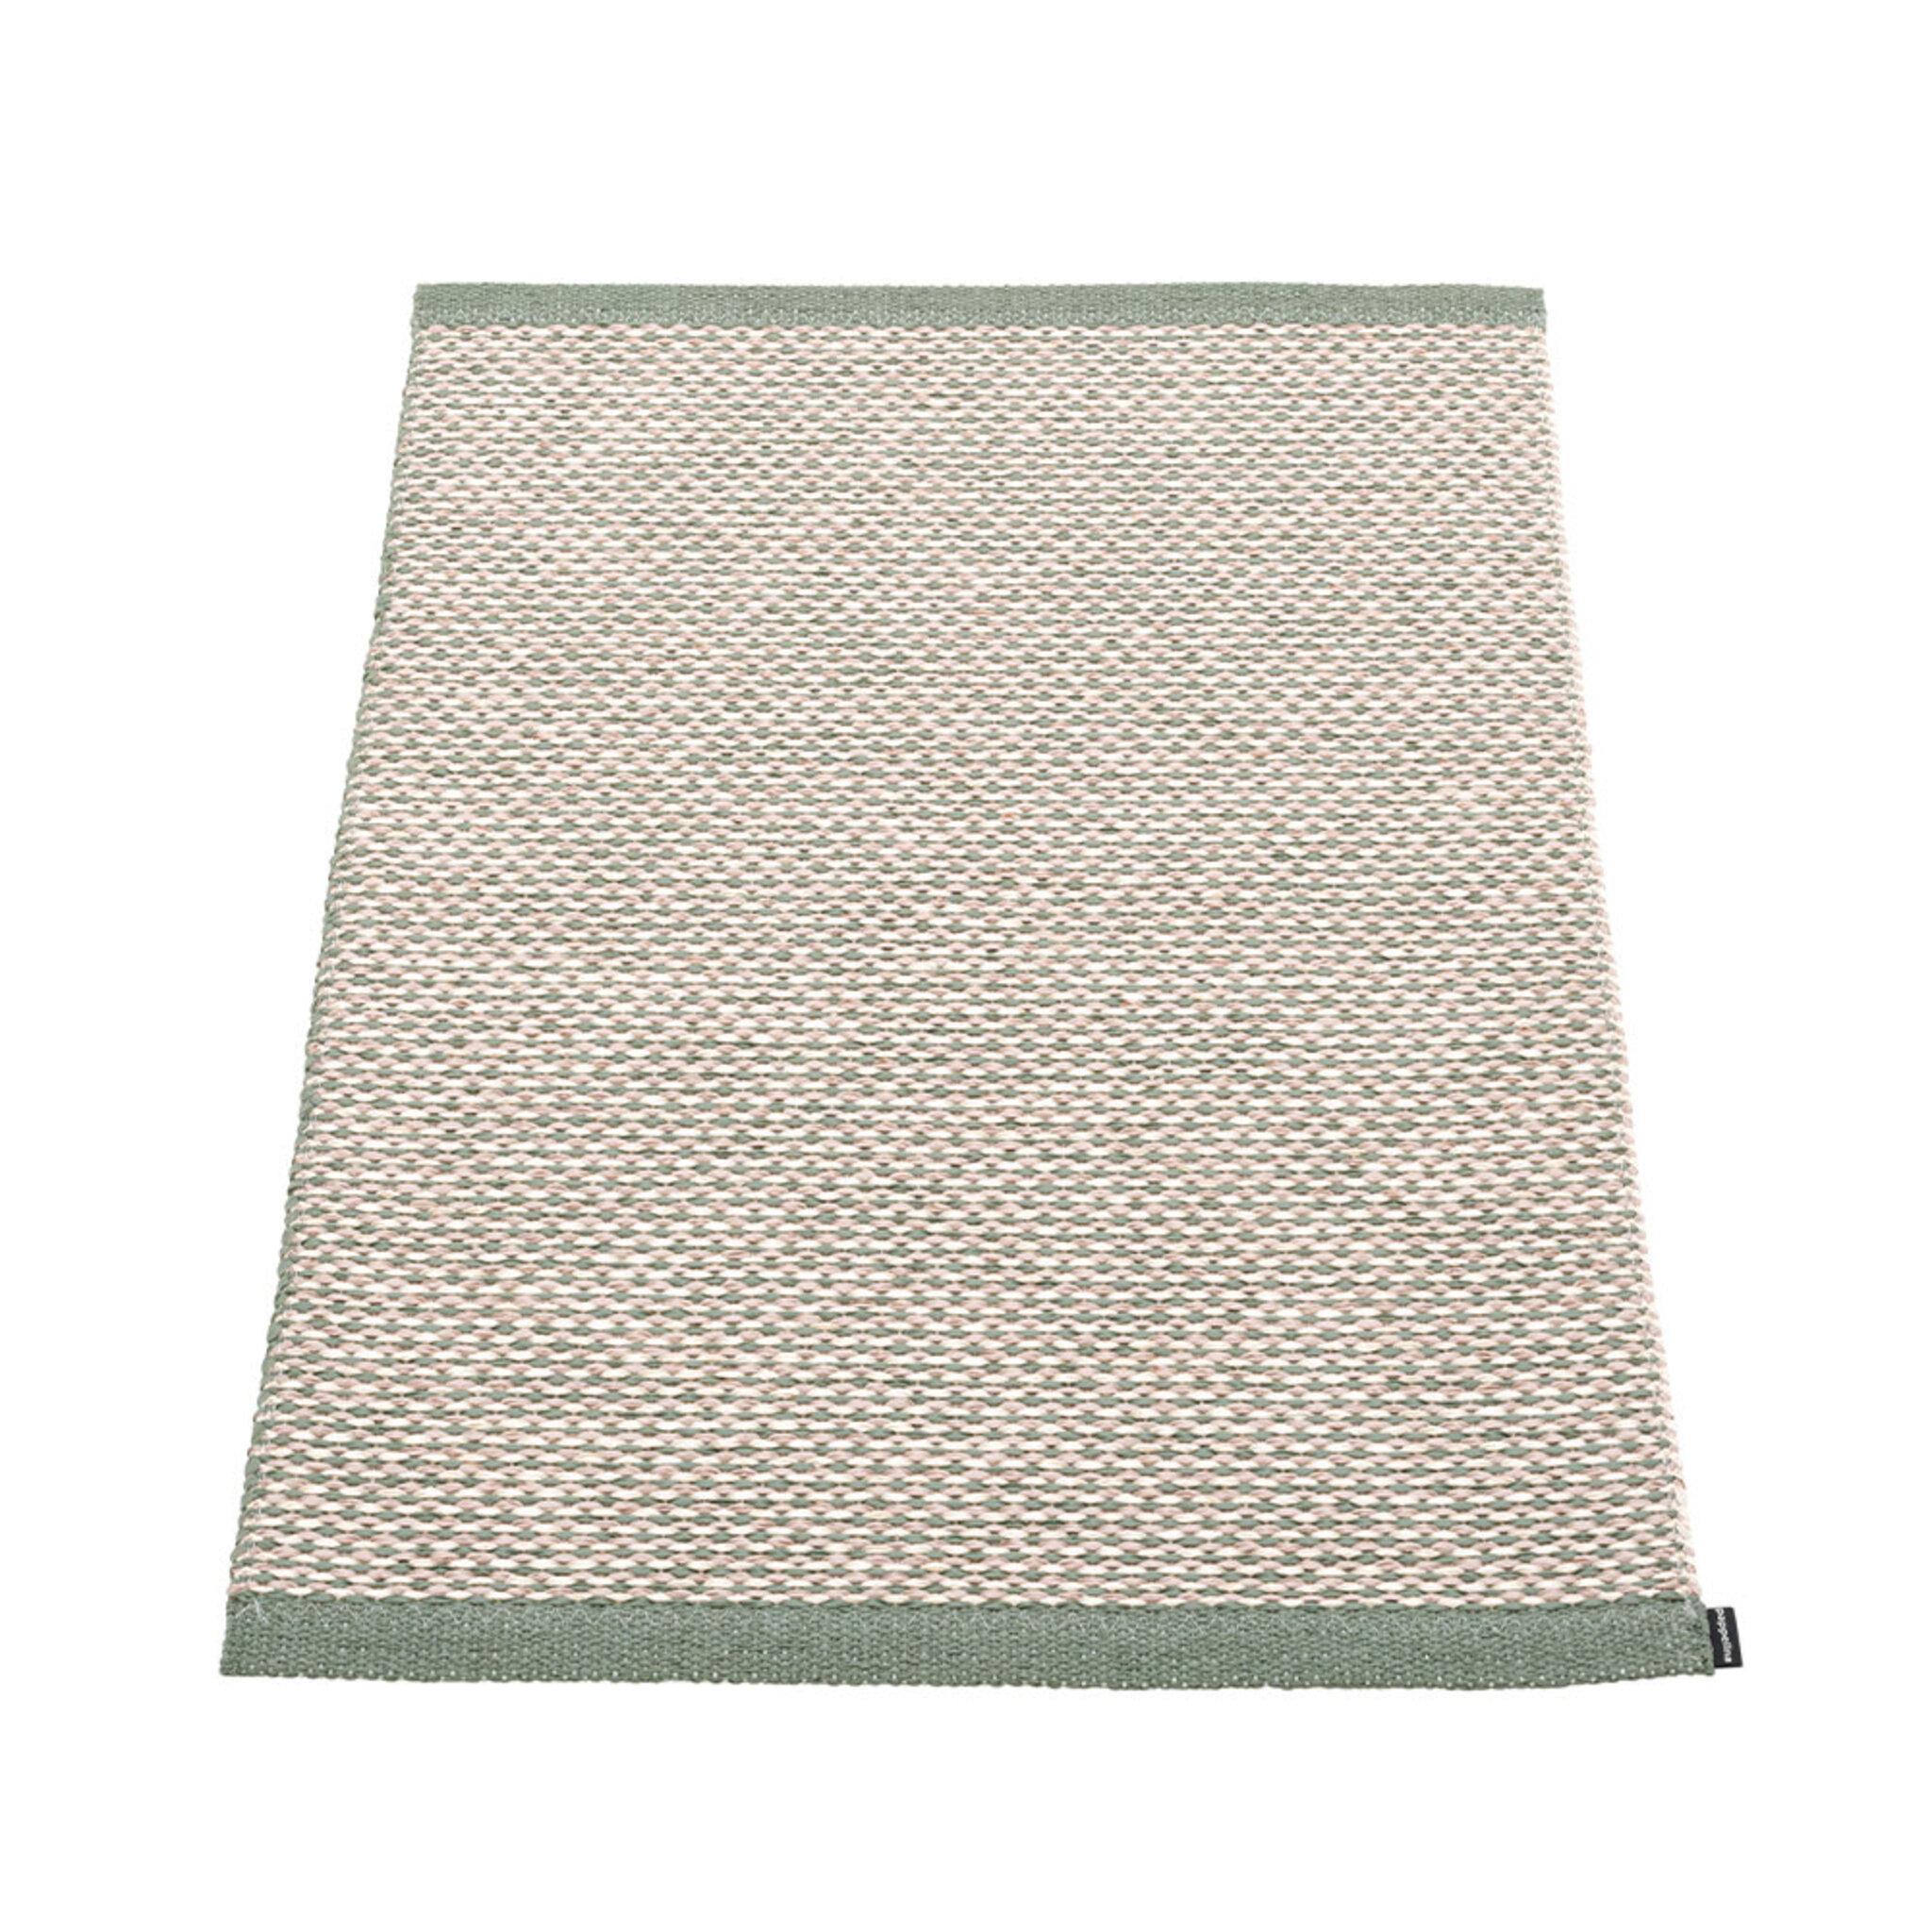 Plastmatta 85 cm - Effi, 60x85cm